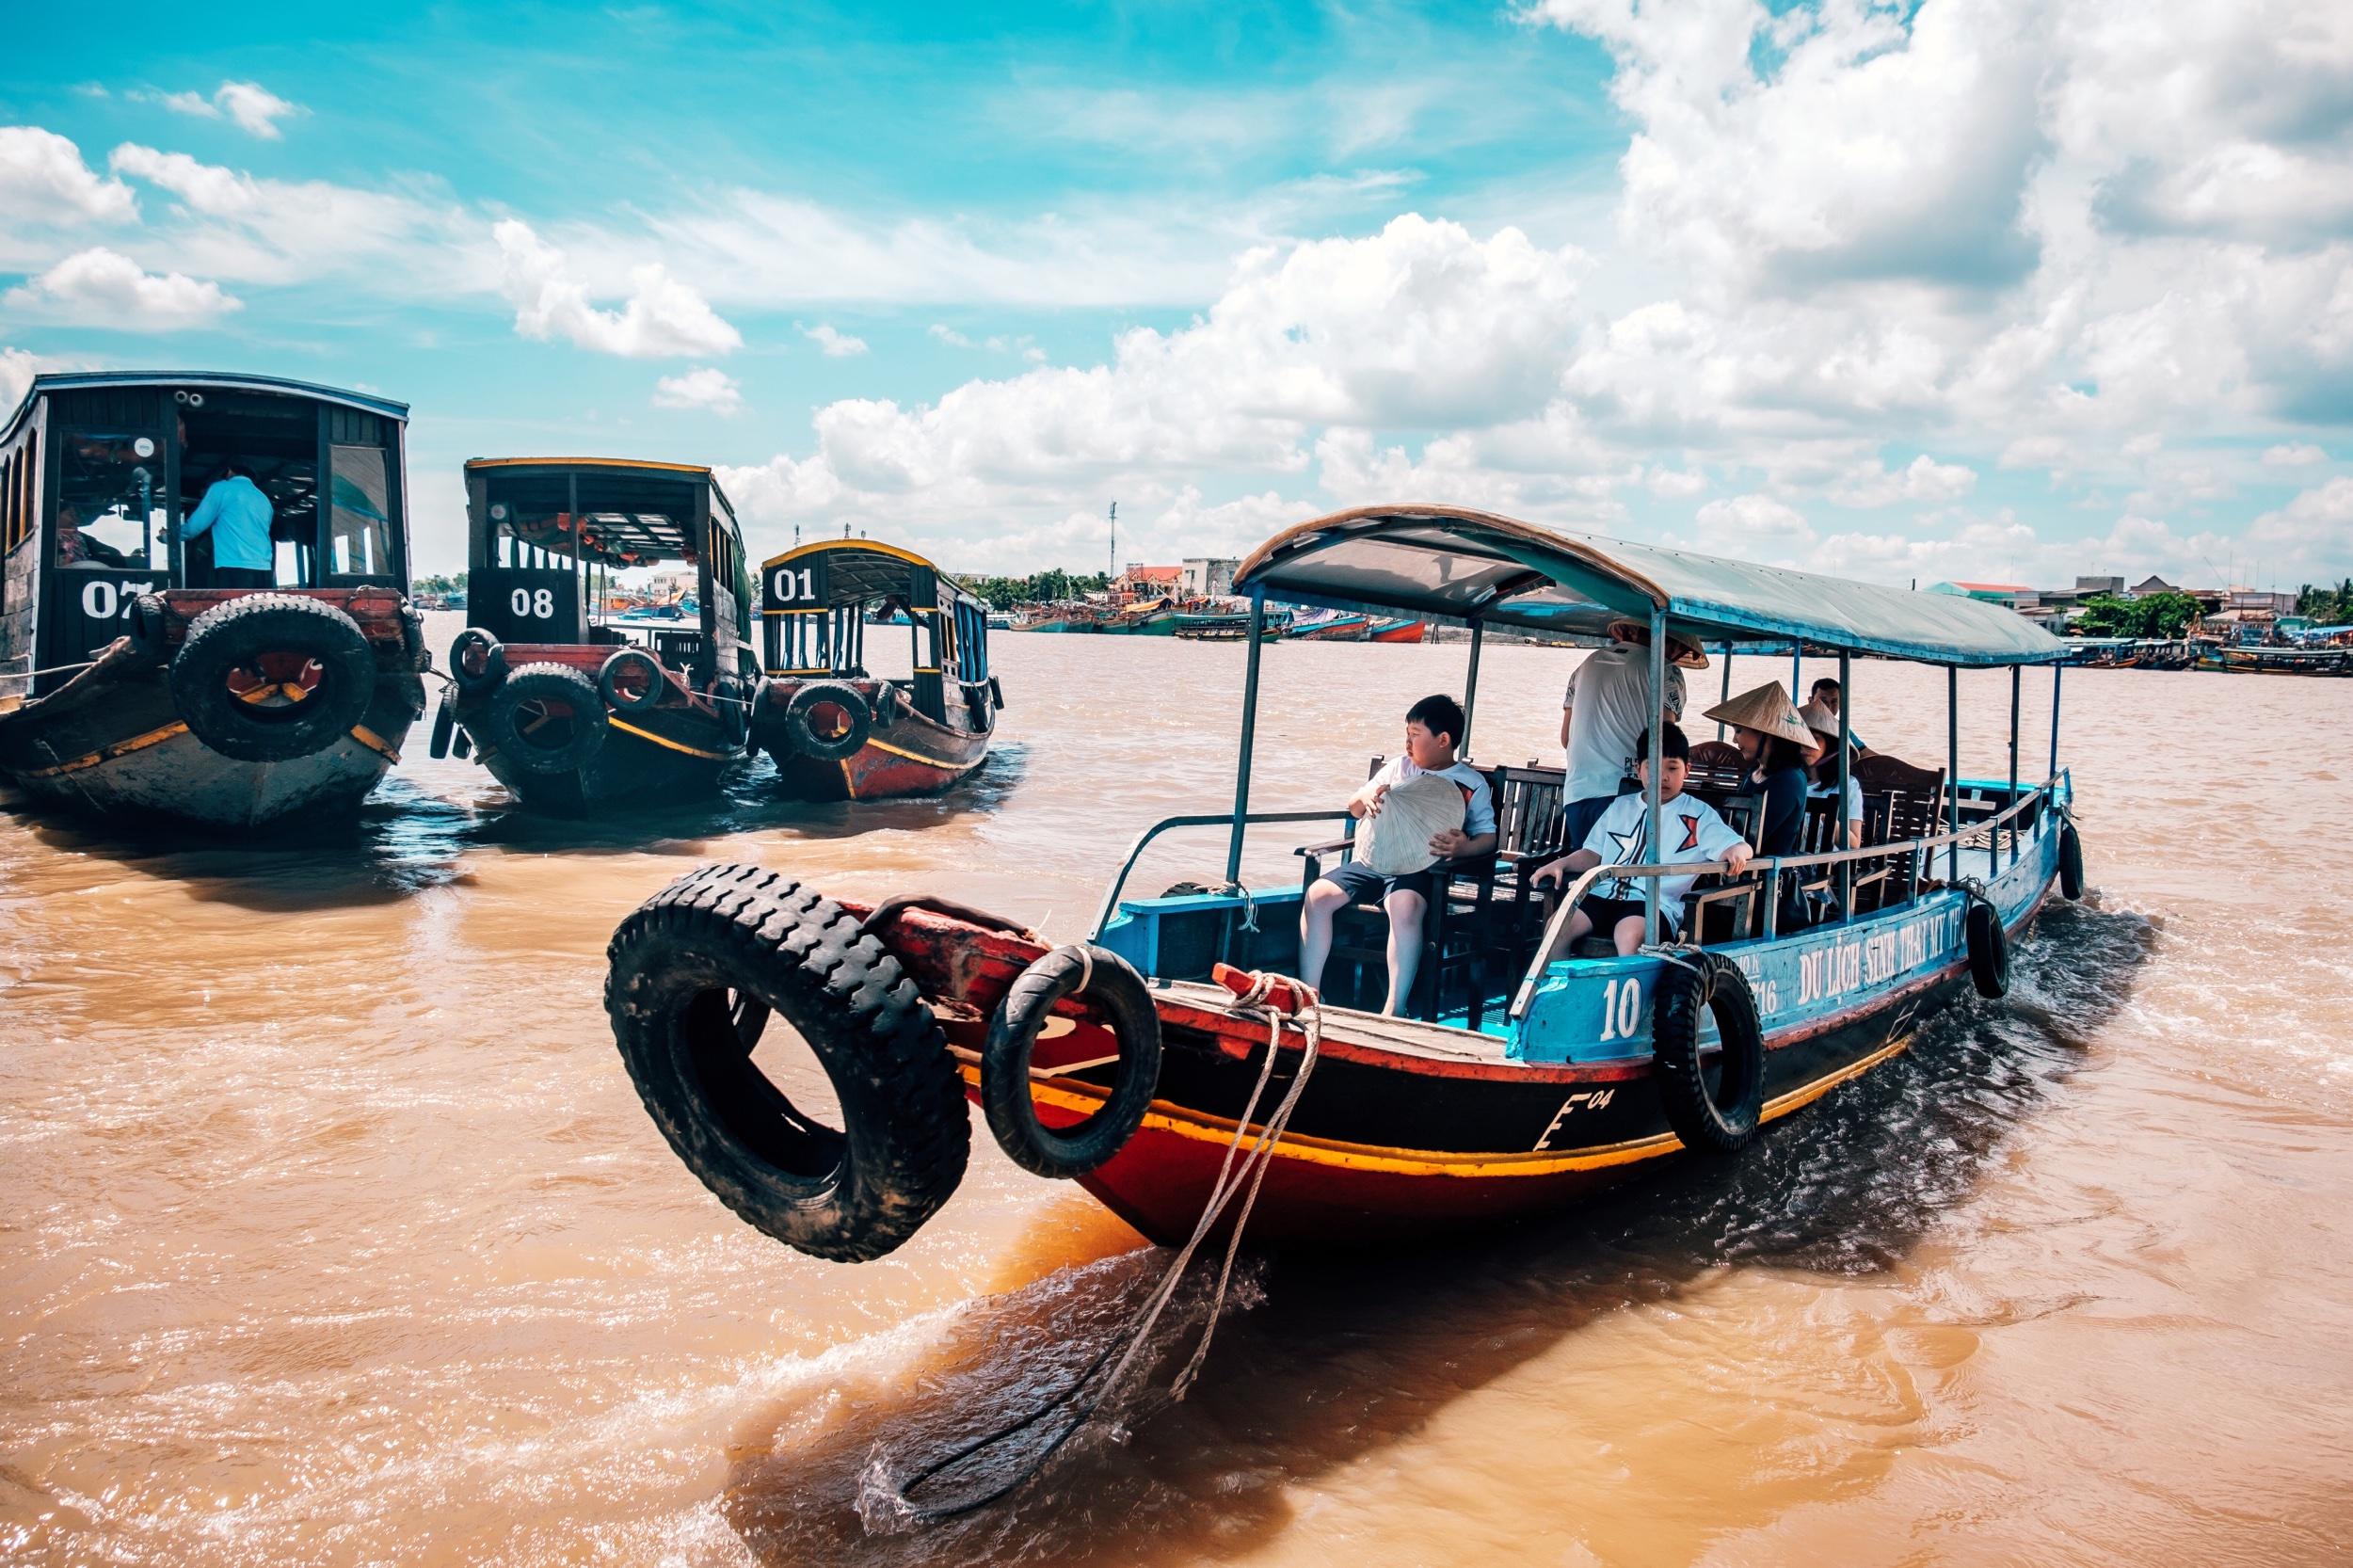 Mekong Delta Tour boats